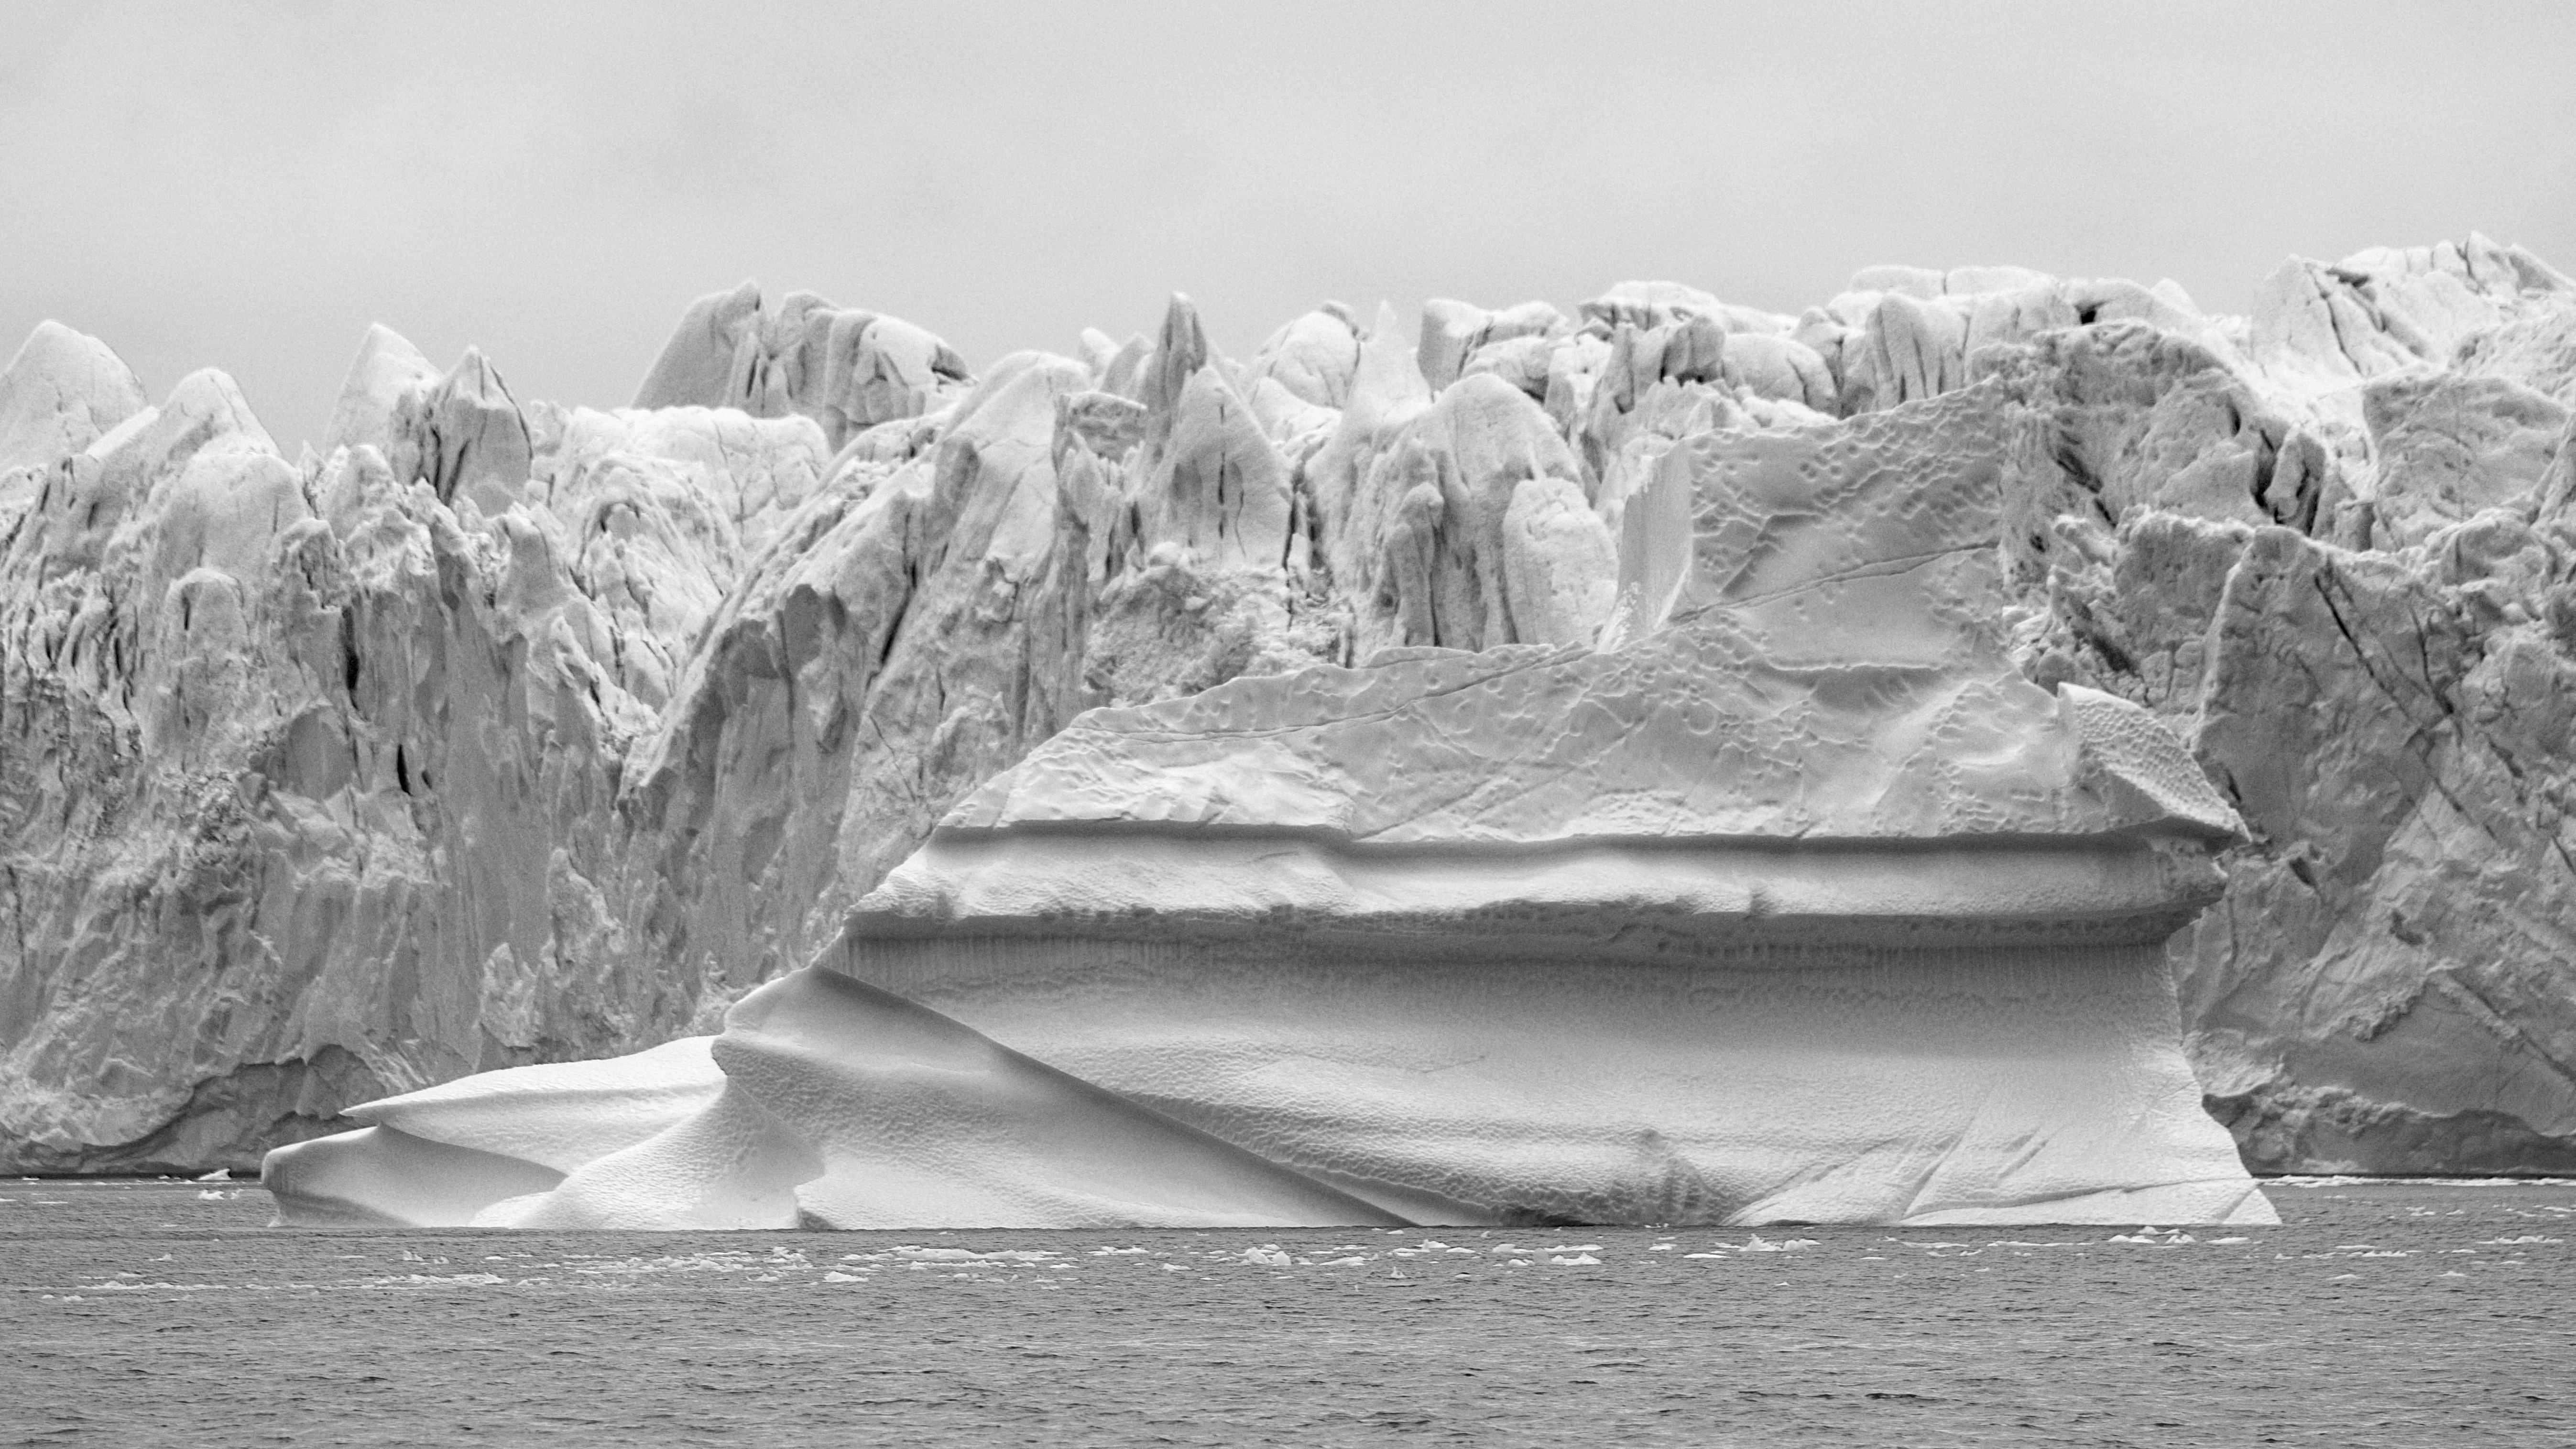 97493 Заставки и Обои Лед на телефон. Скачать Лед, Зима, Природа, Арктика, Айсберг картинки бесплатно